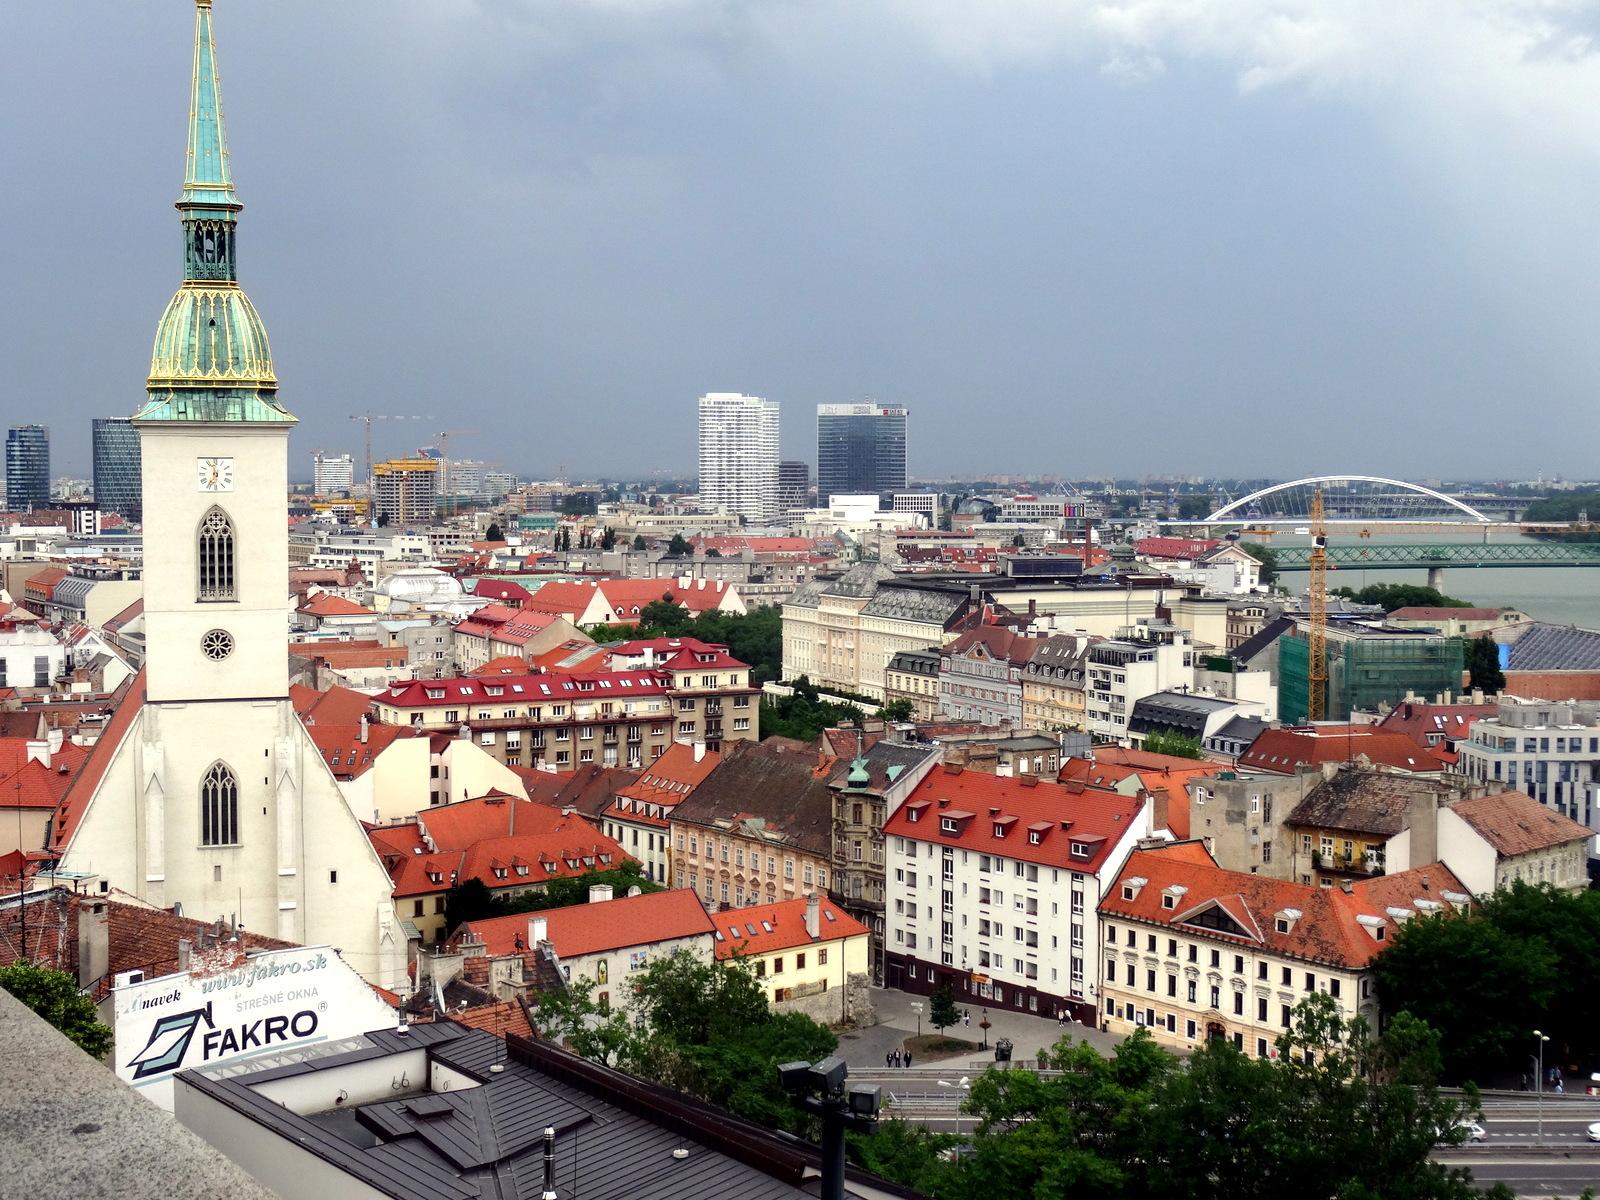 cc472851e Arriving in Old Town Bratislava, Slovak Food Festival and Dinner at  Parlement Restaurant